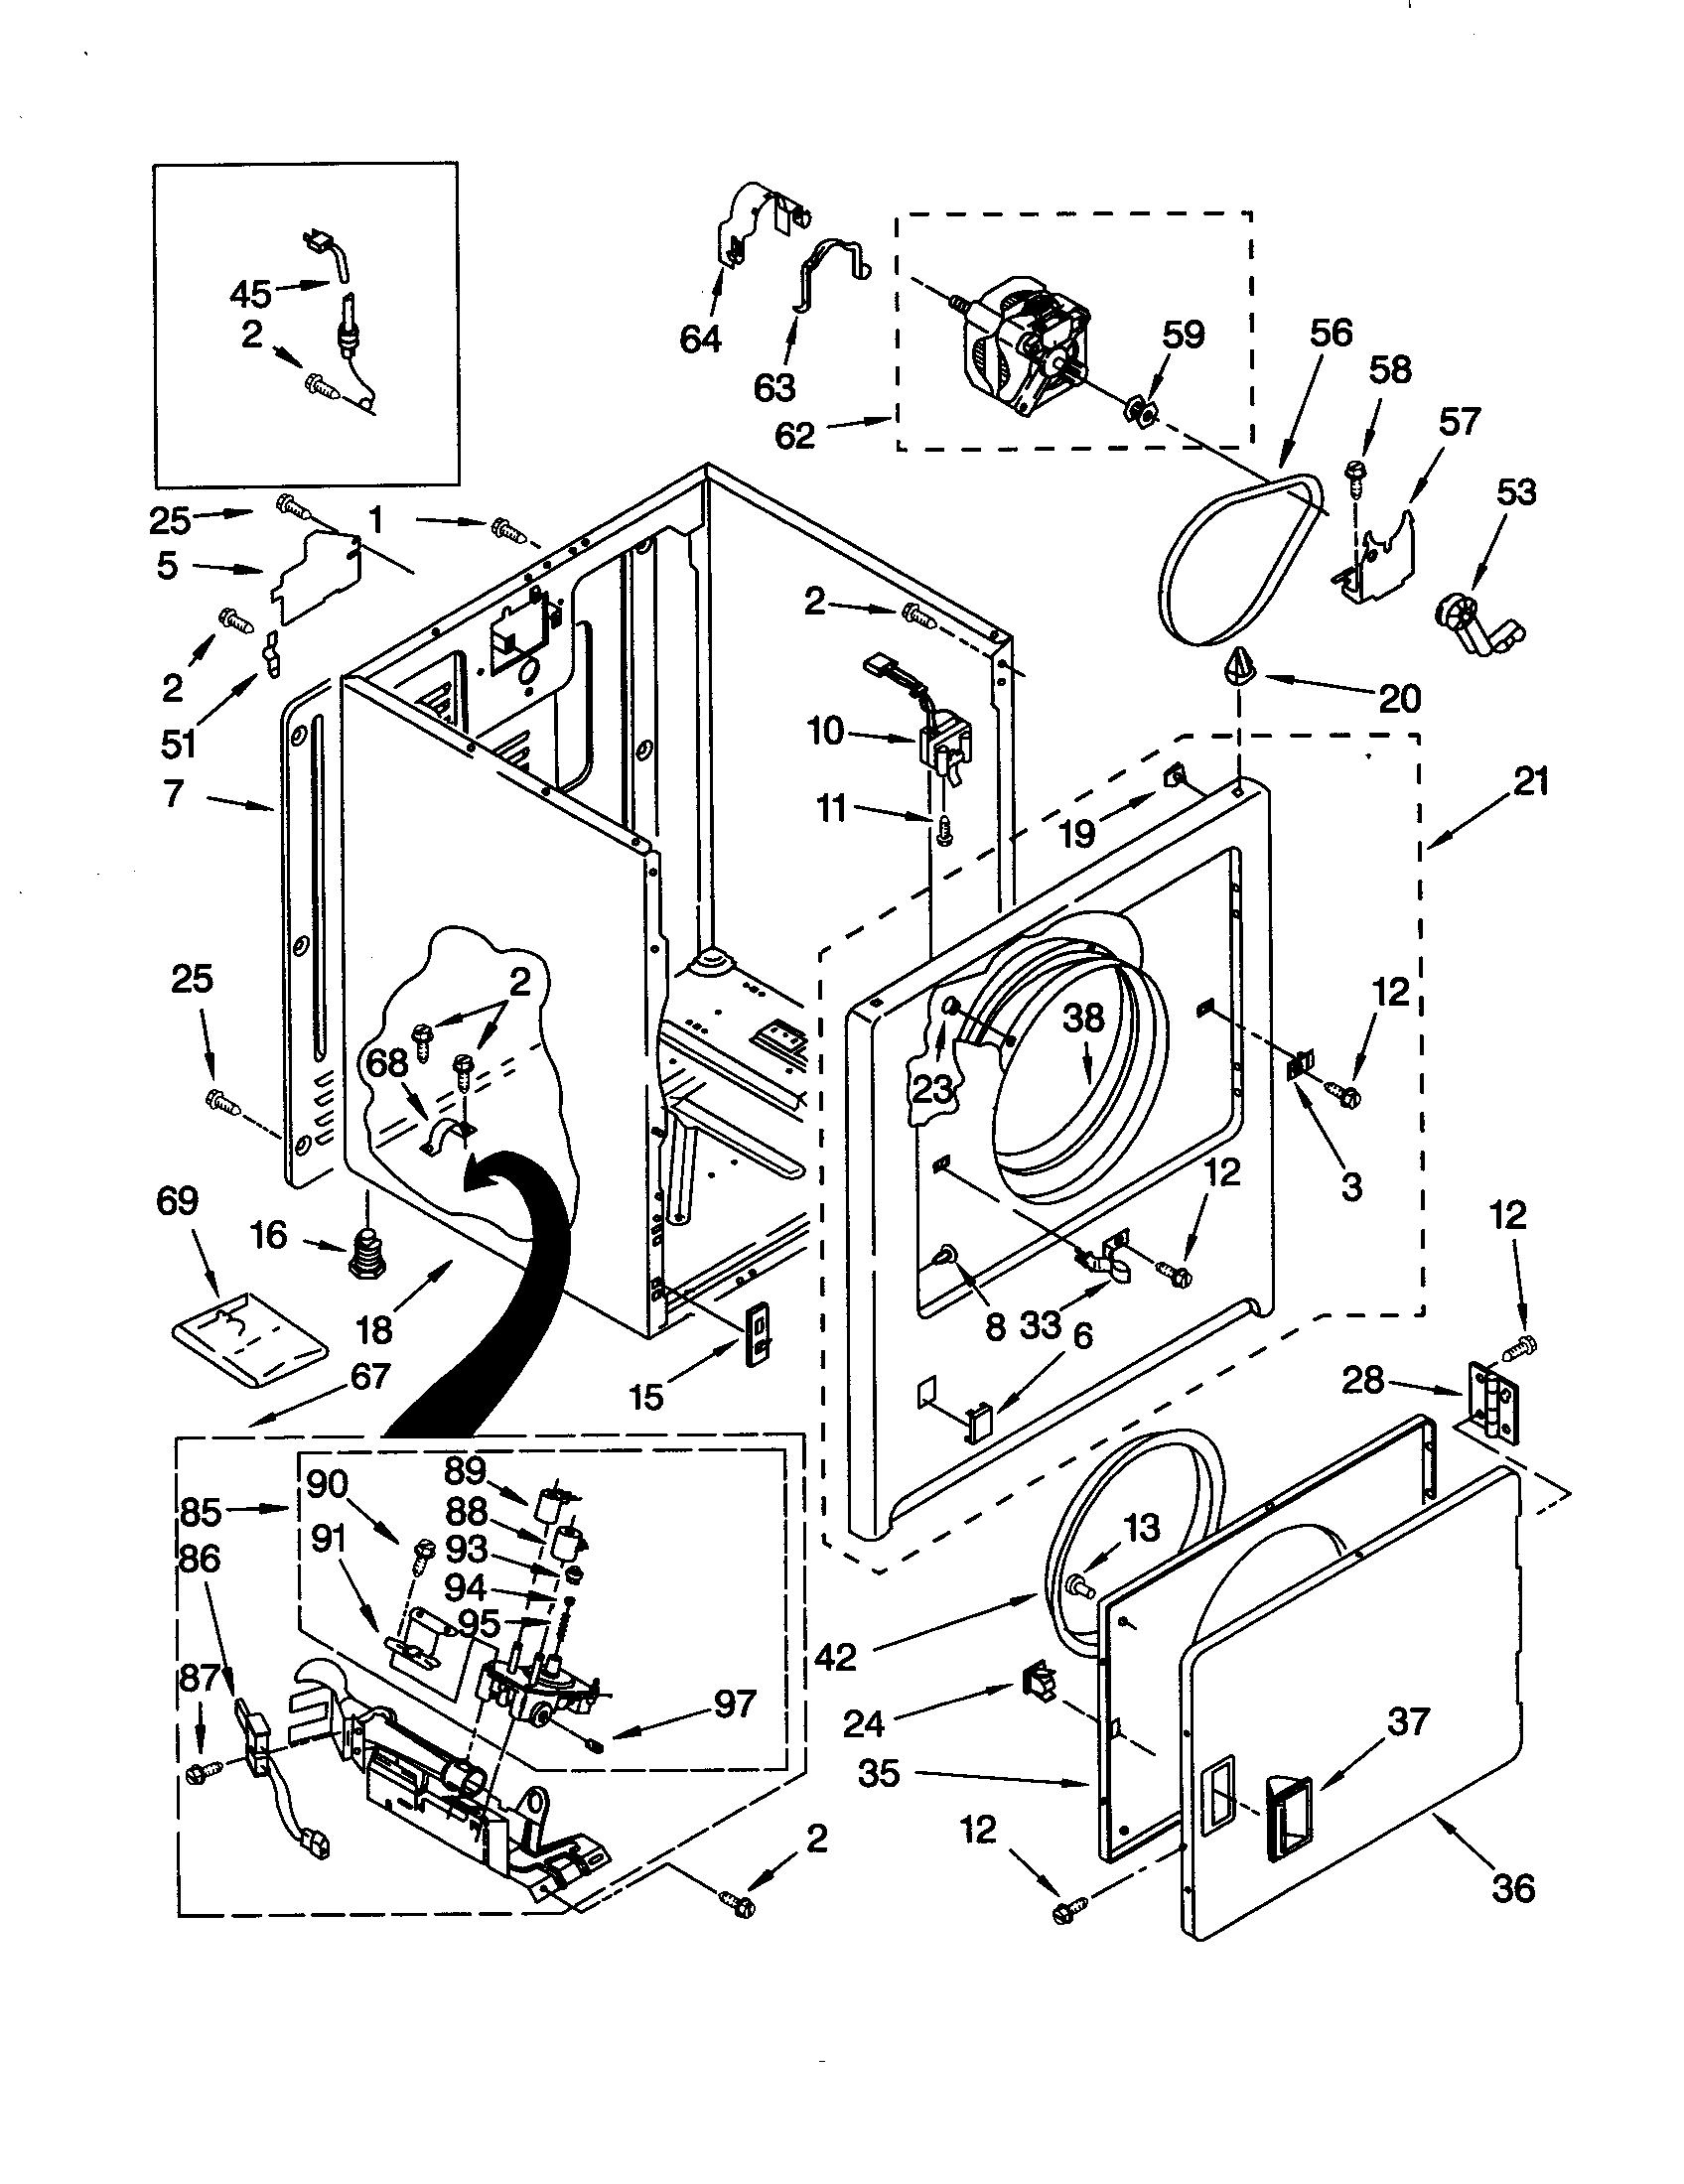 Kitchenaid Compactor Parts Diagram Trash Drive Intertherm Wiring Sears